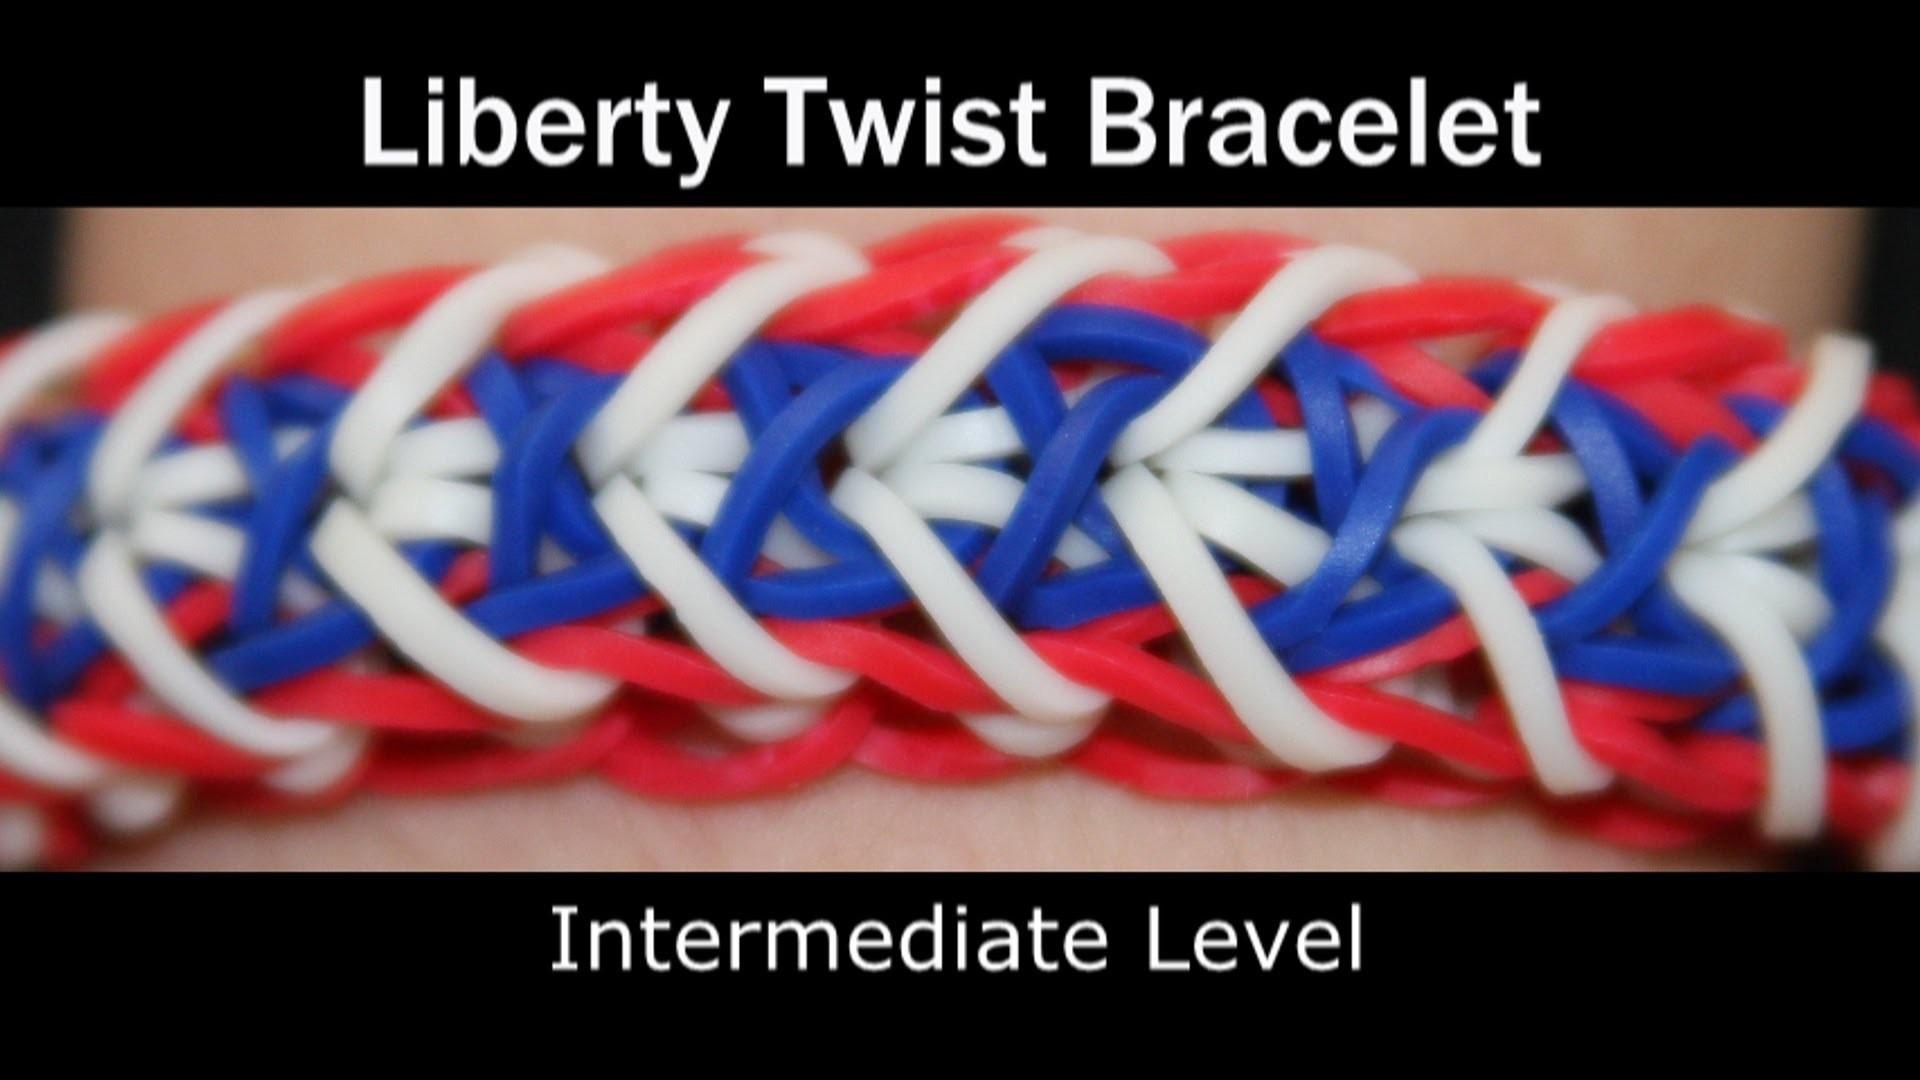 Rainbow Loom® Liberty Twist Bracelet